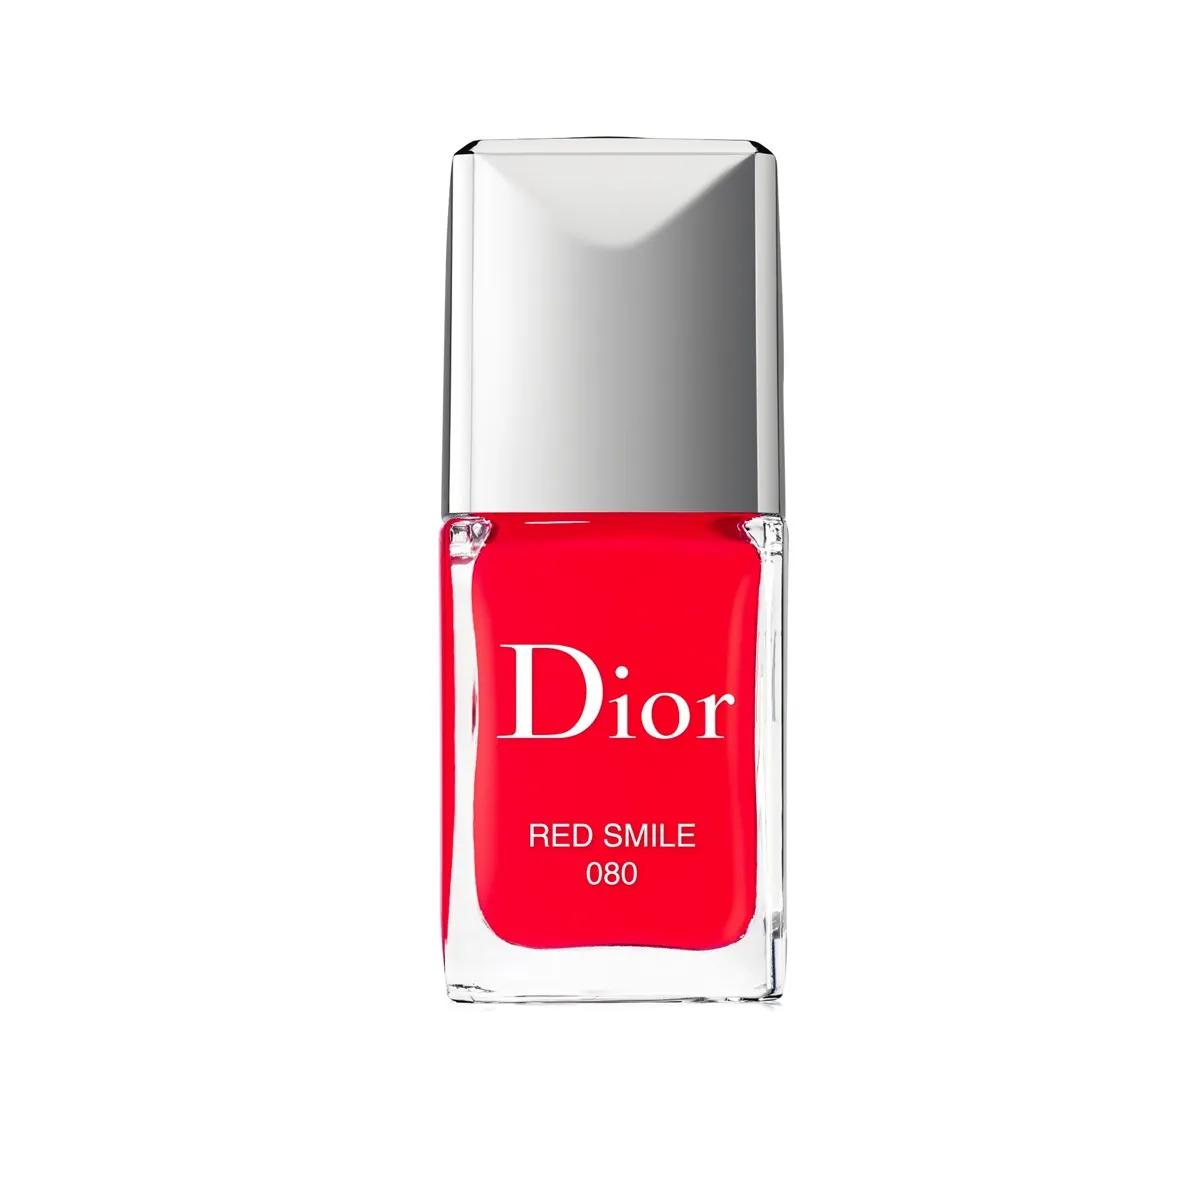 Dior Vernis Gel Shine in Red Smile